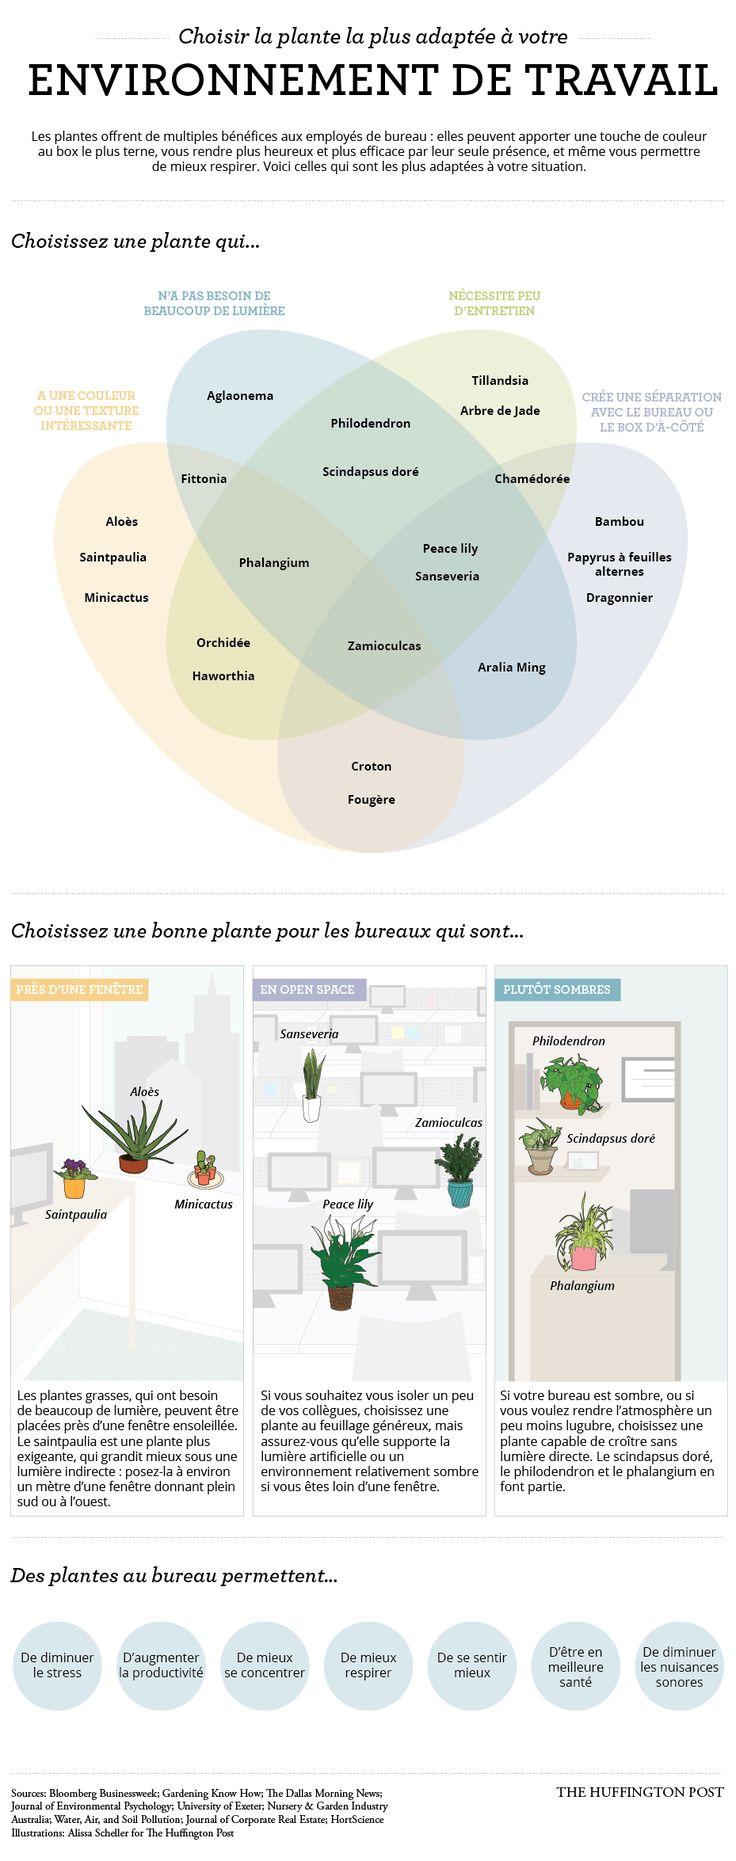 "#Organisation #Travail ""Bienetre Choisir sa plante pour son #bureau..."